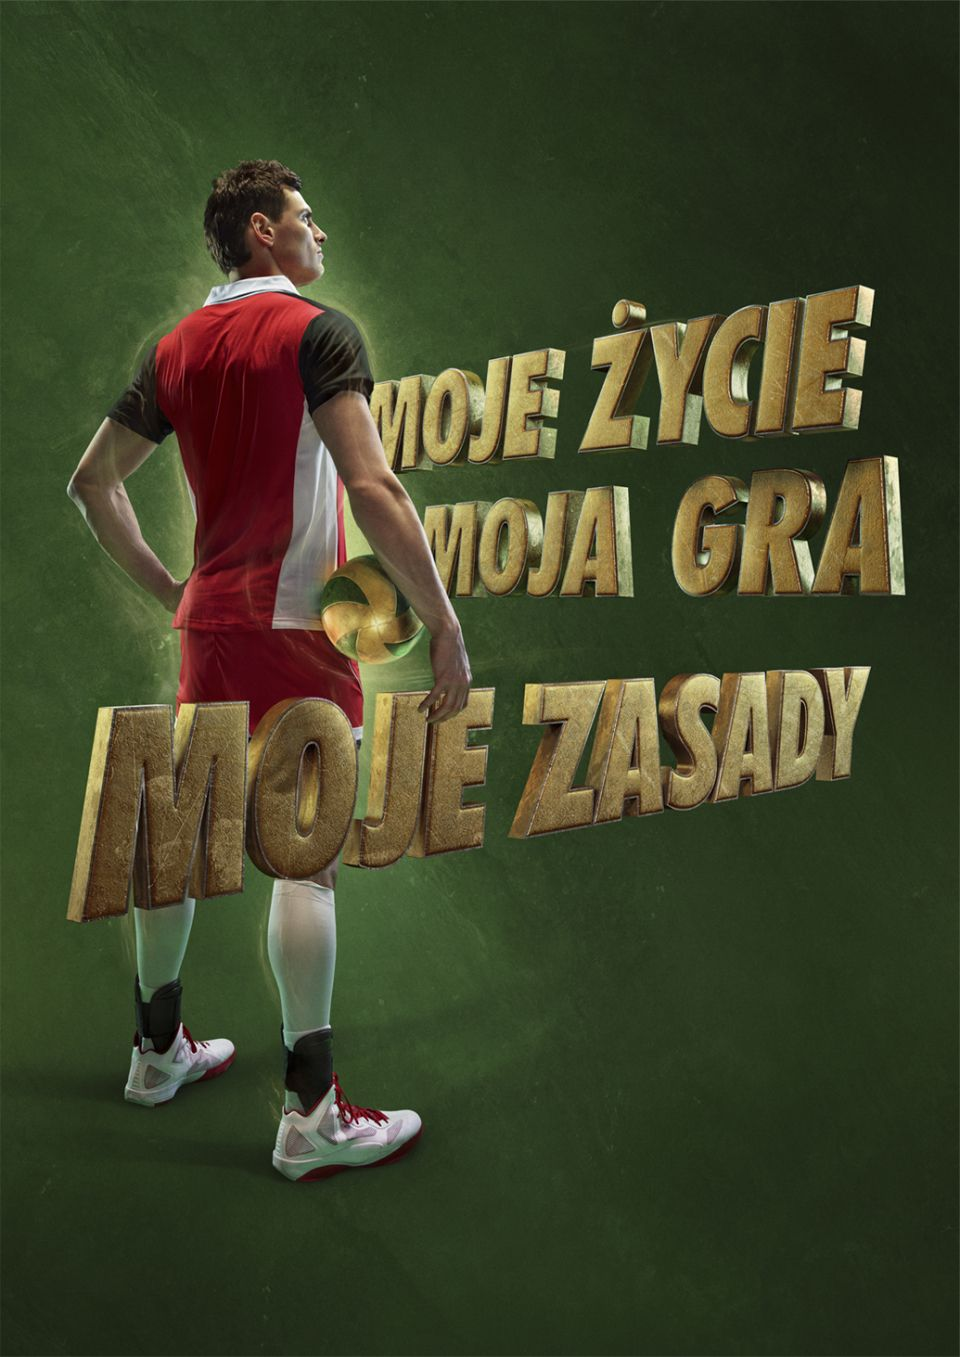 Szymon Świętochowski Photography – okocim for ars thanea